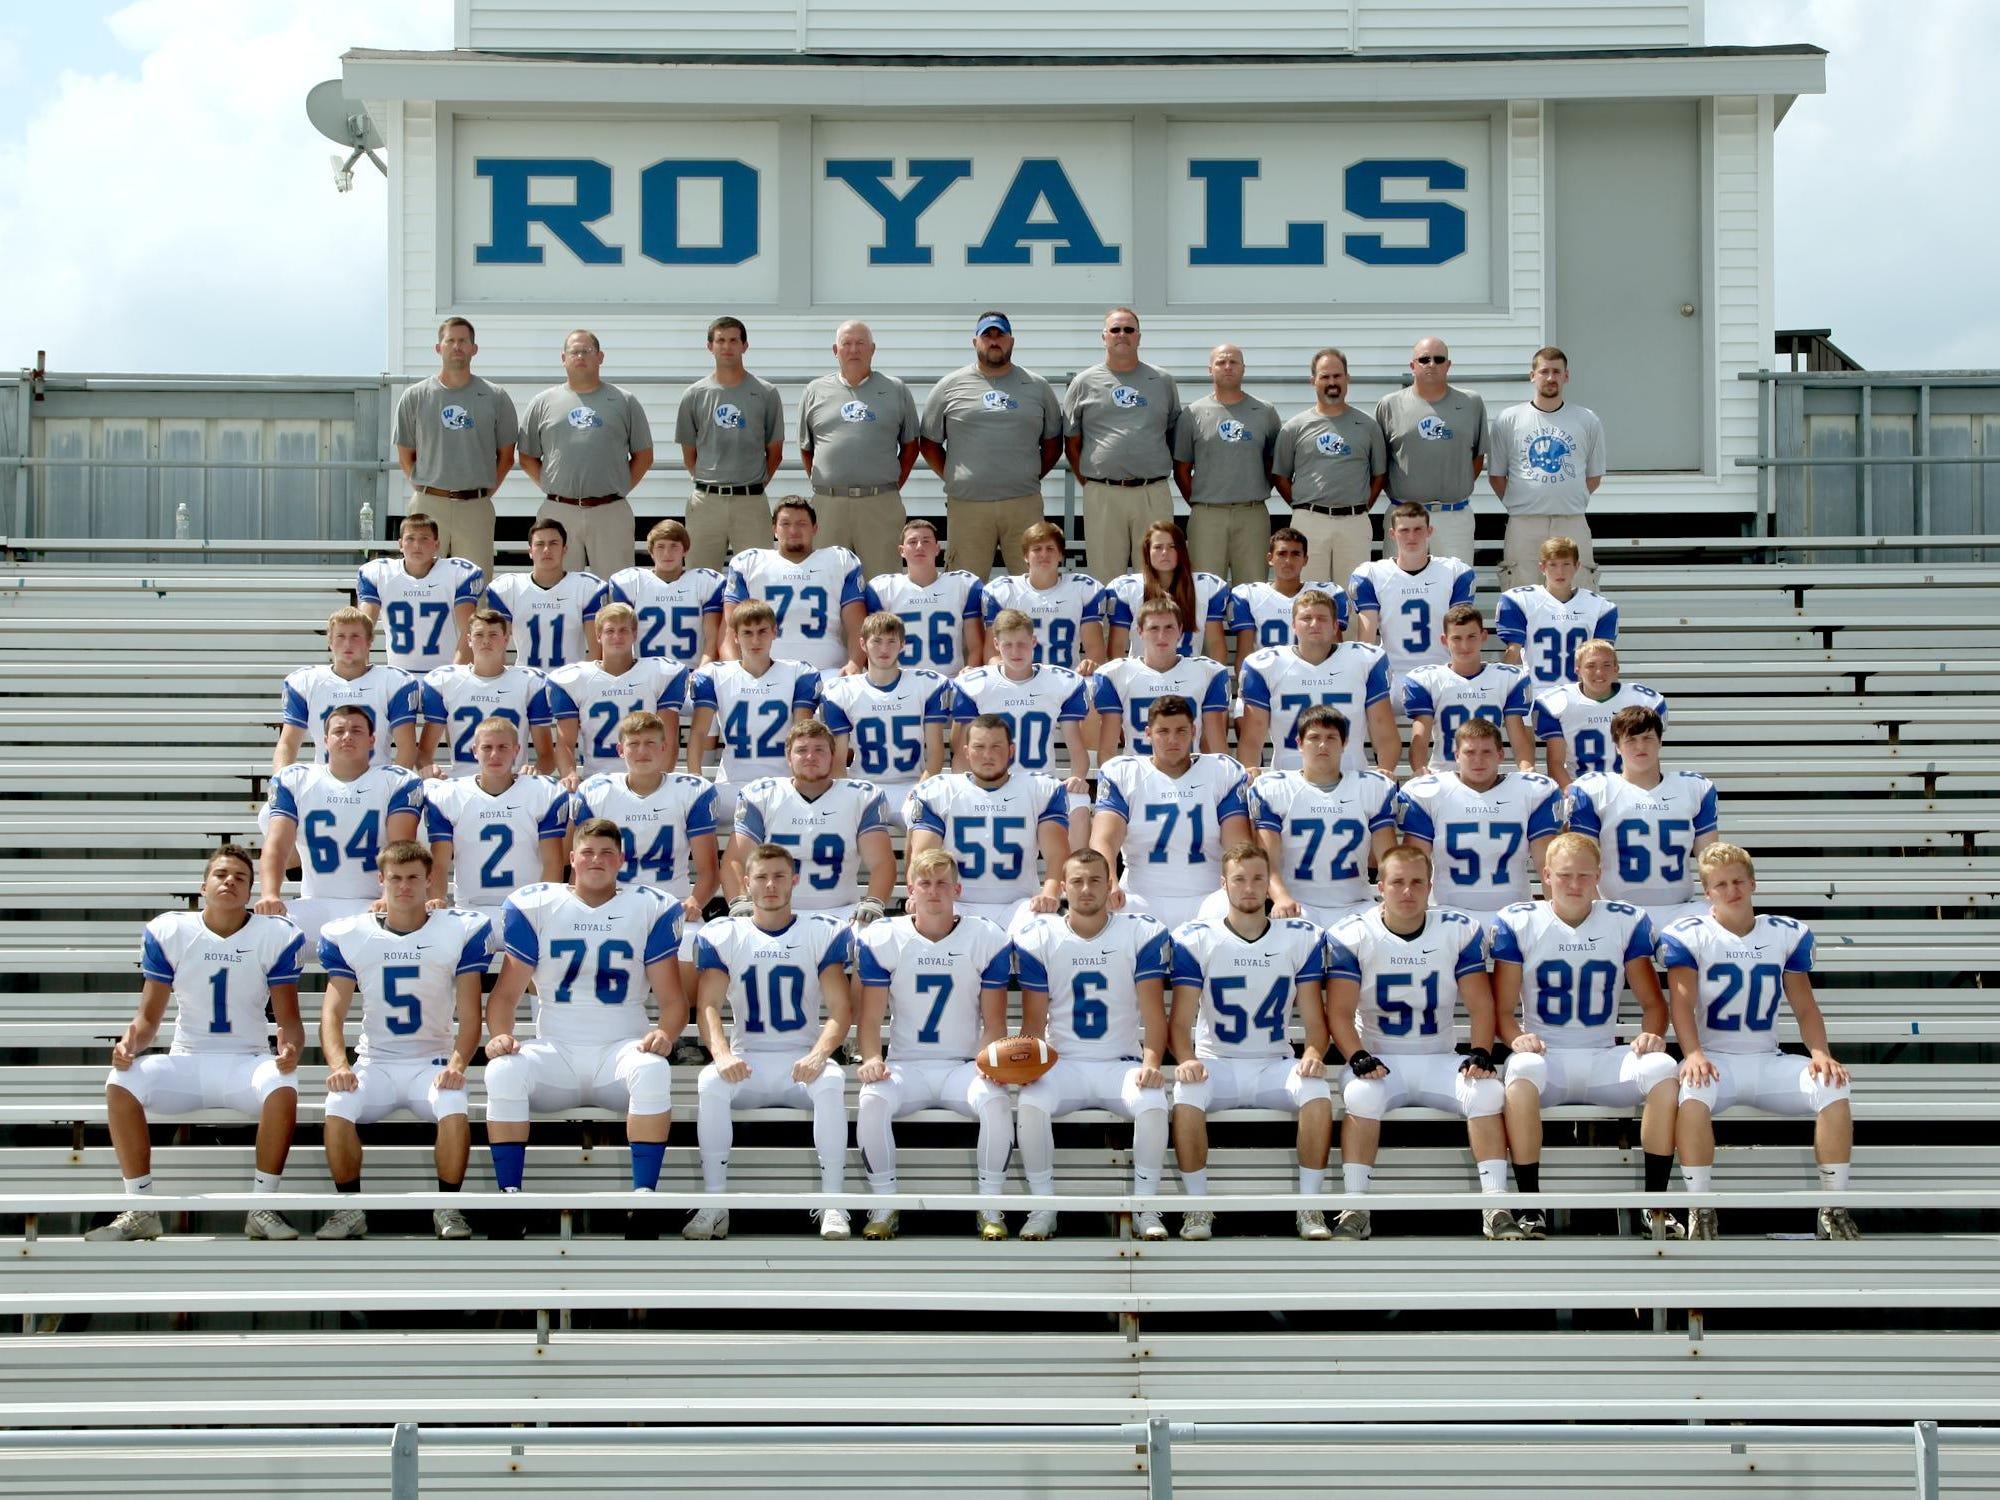 The 2015 Royals.